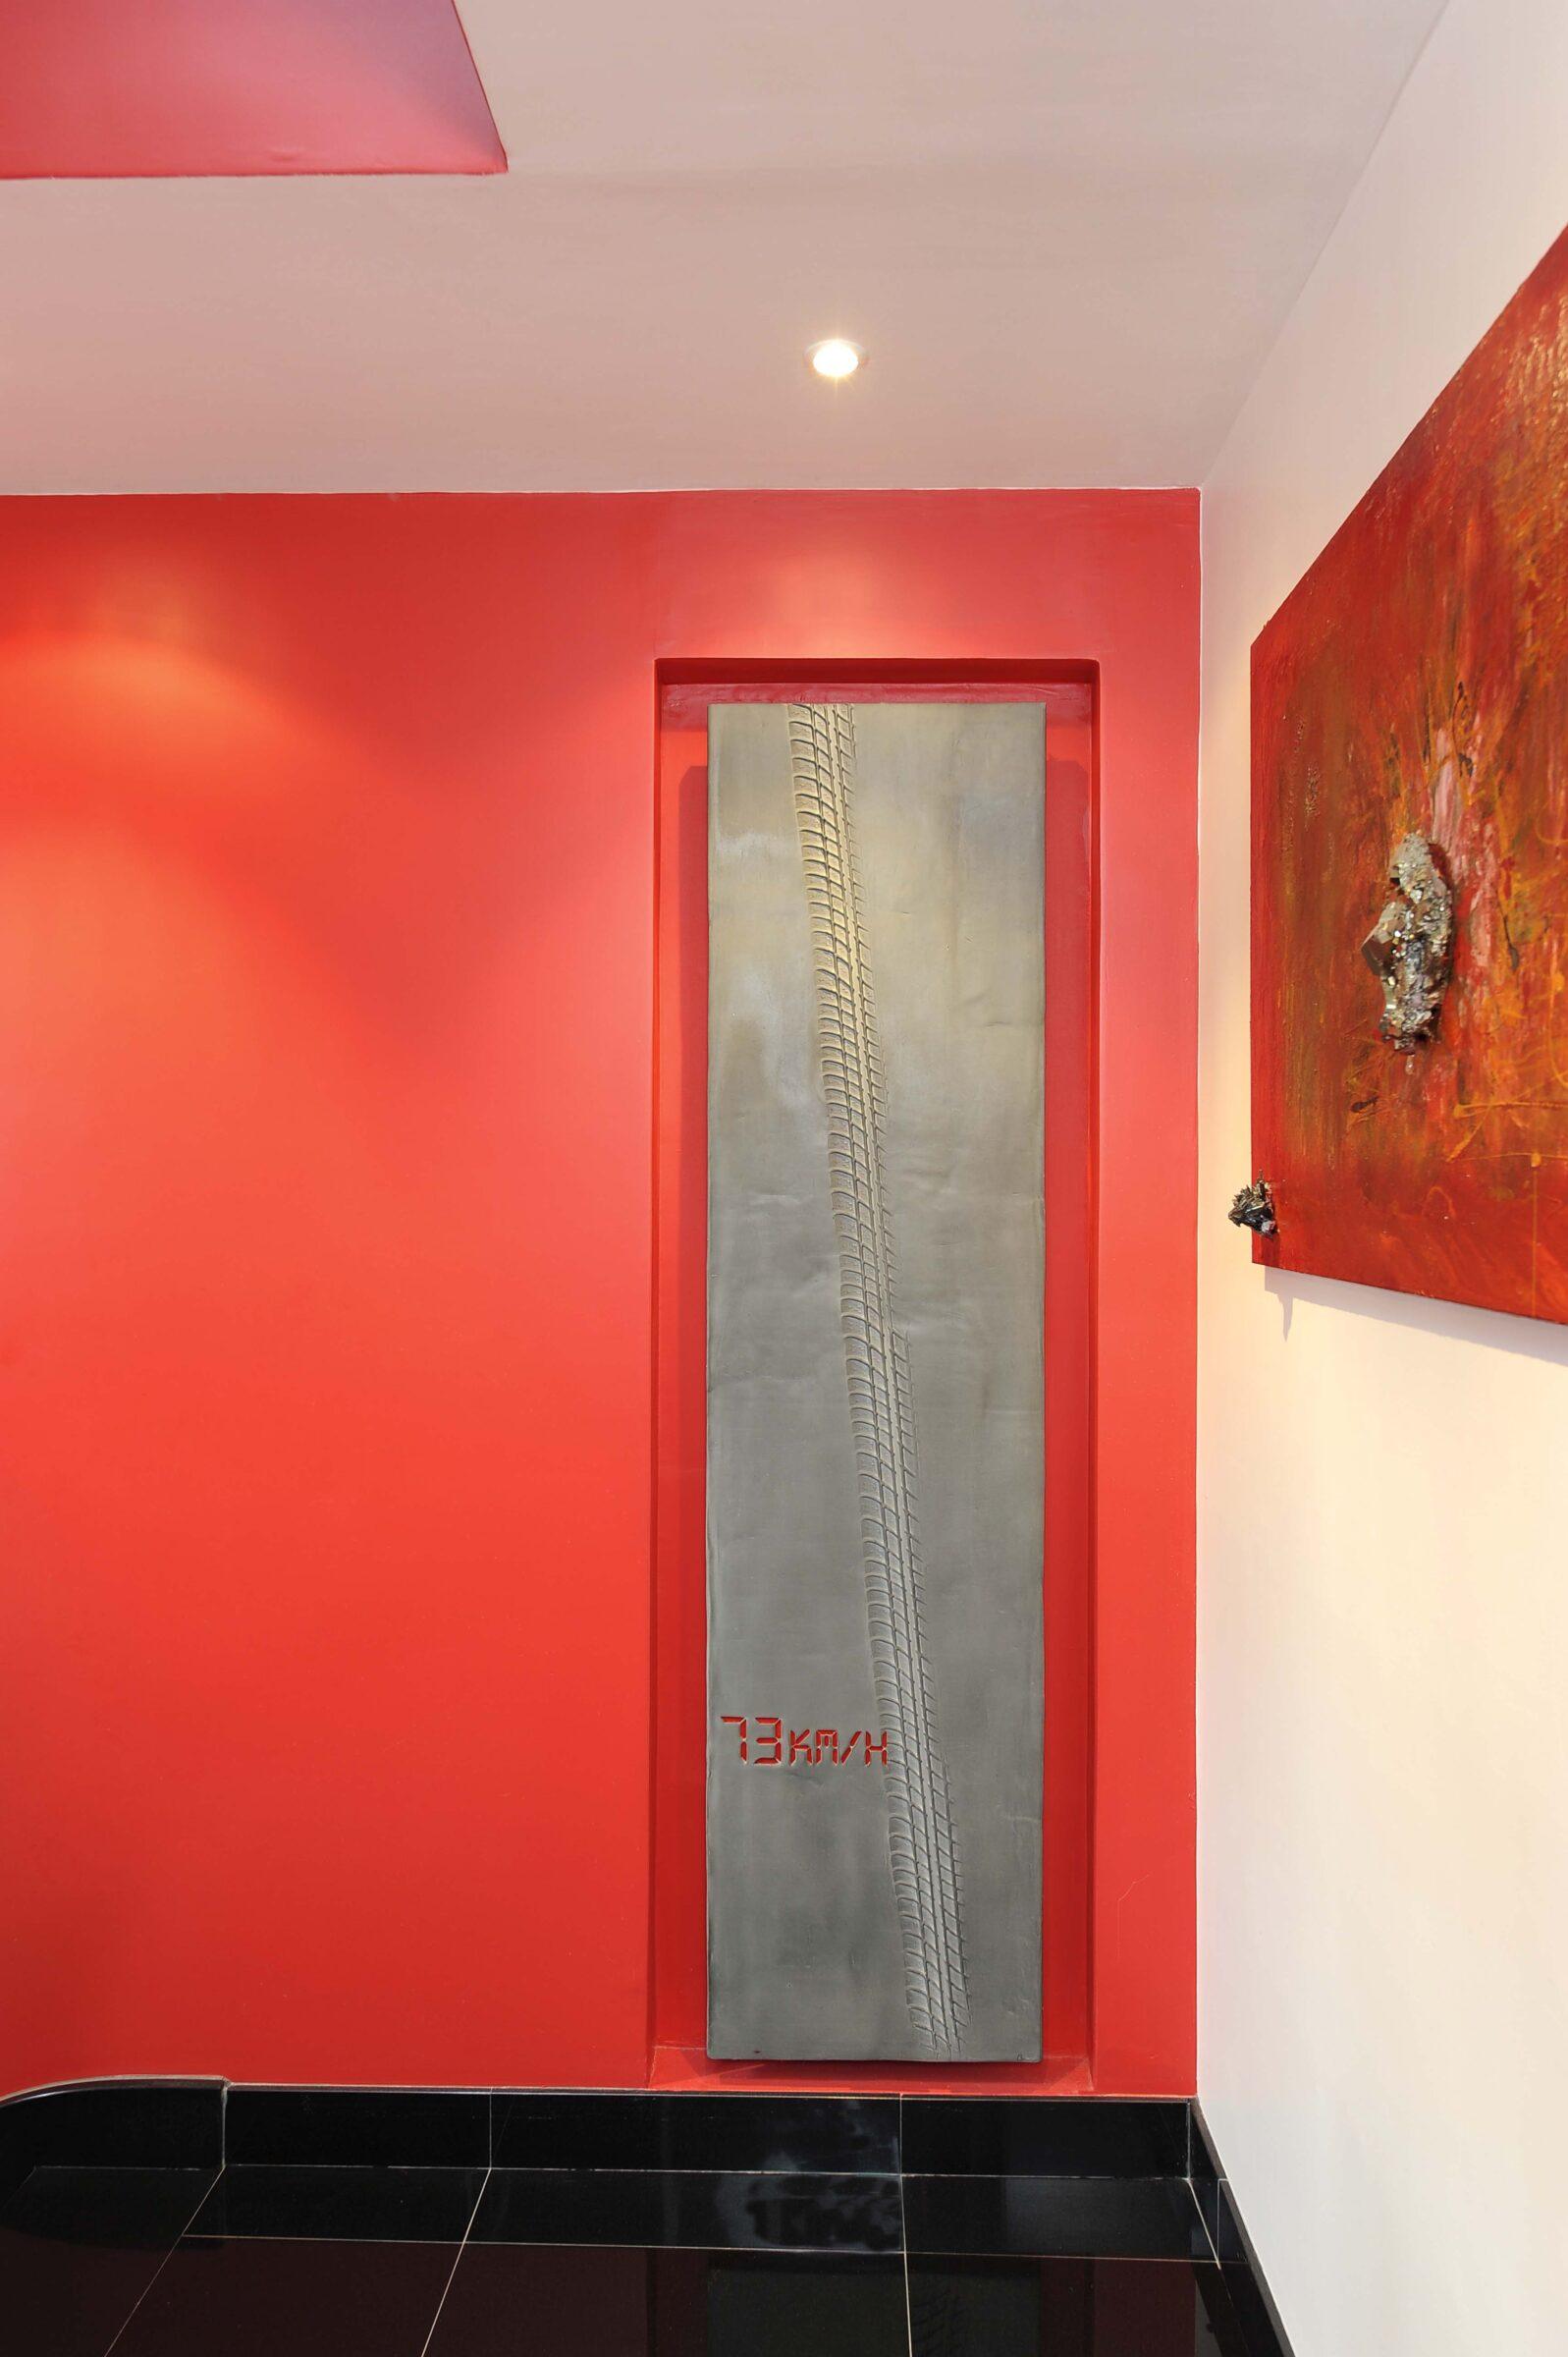 Cinier-73Kmh-artist-Palacio-bd-1597x2400